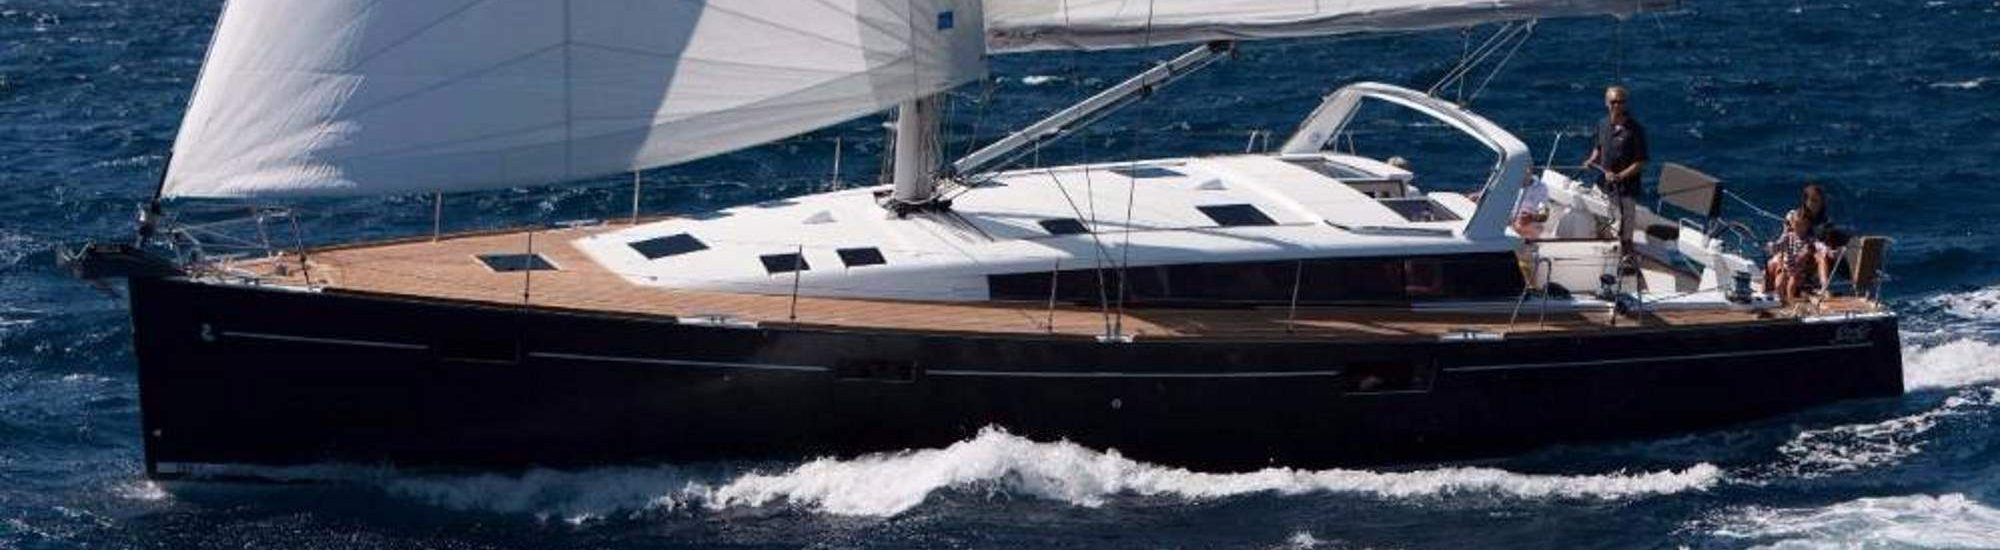 BEneteau Sense 50 cruising charter